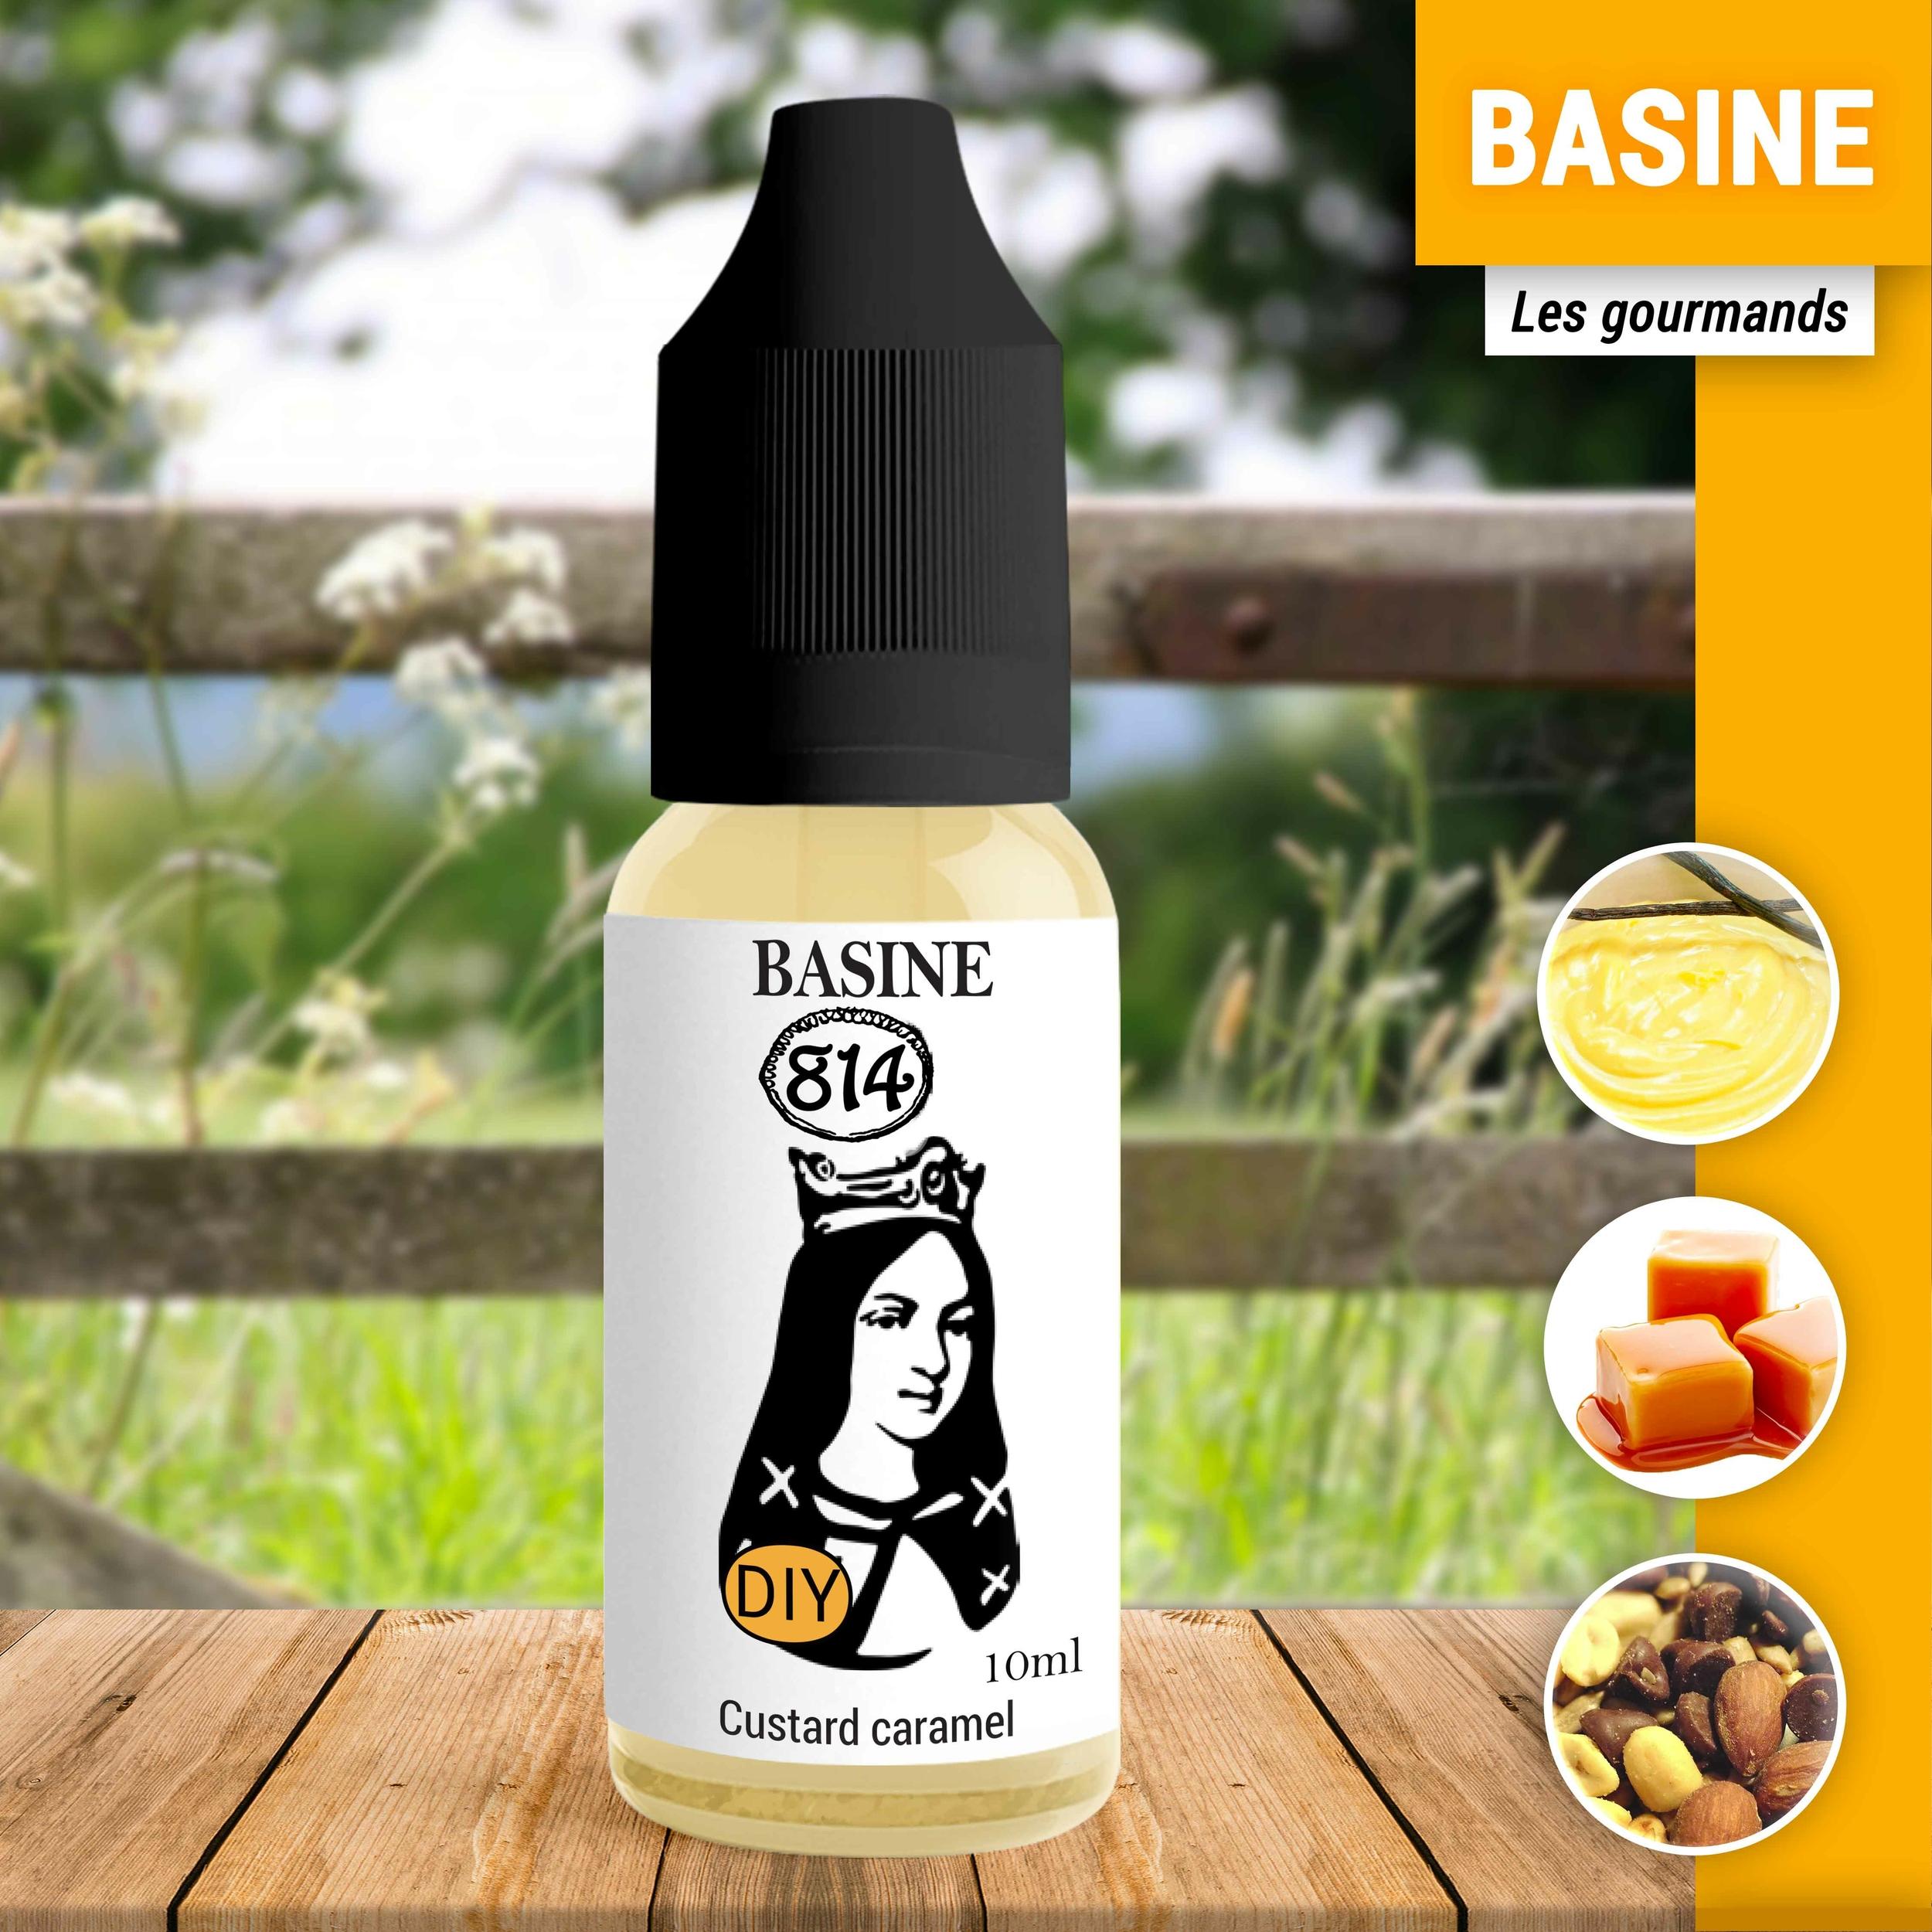 Basine_Gourmands_HD